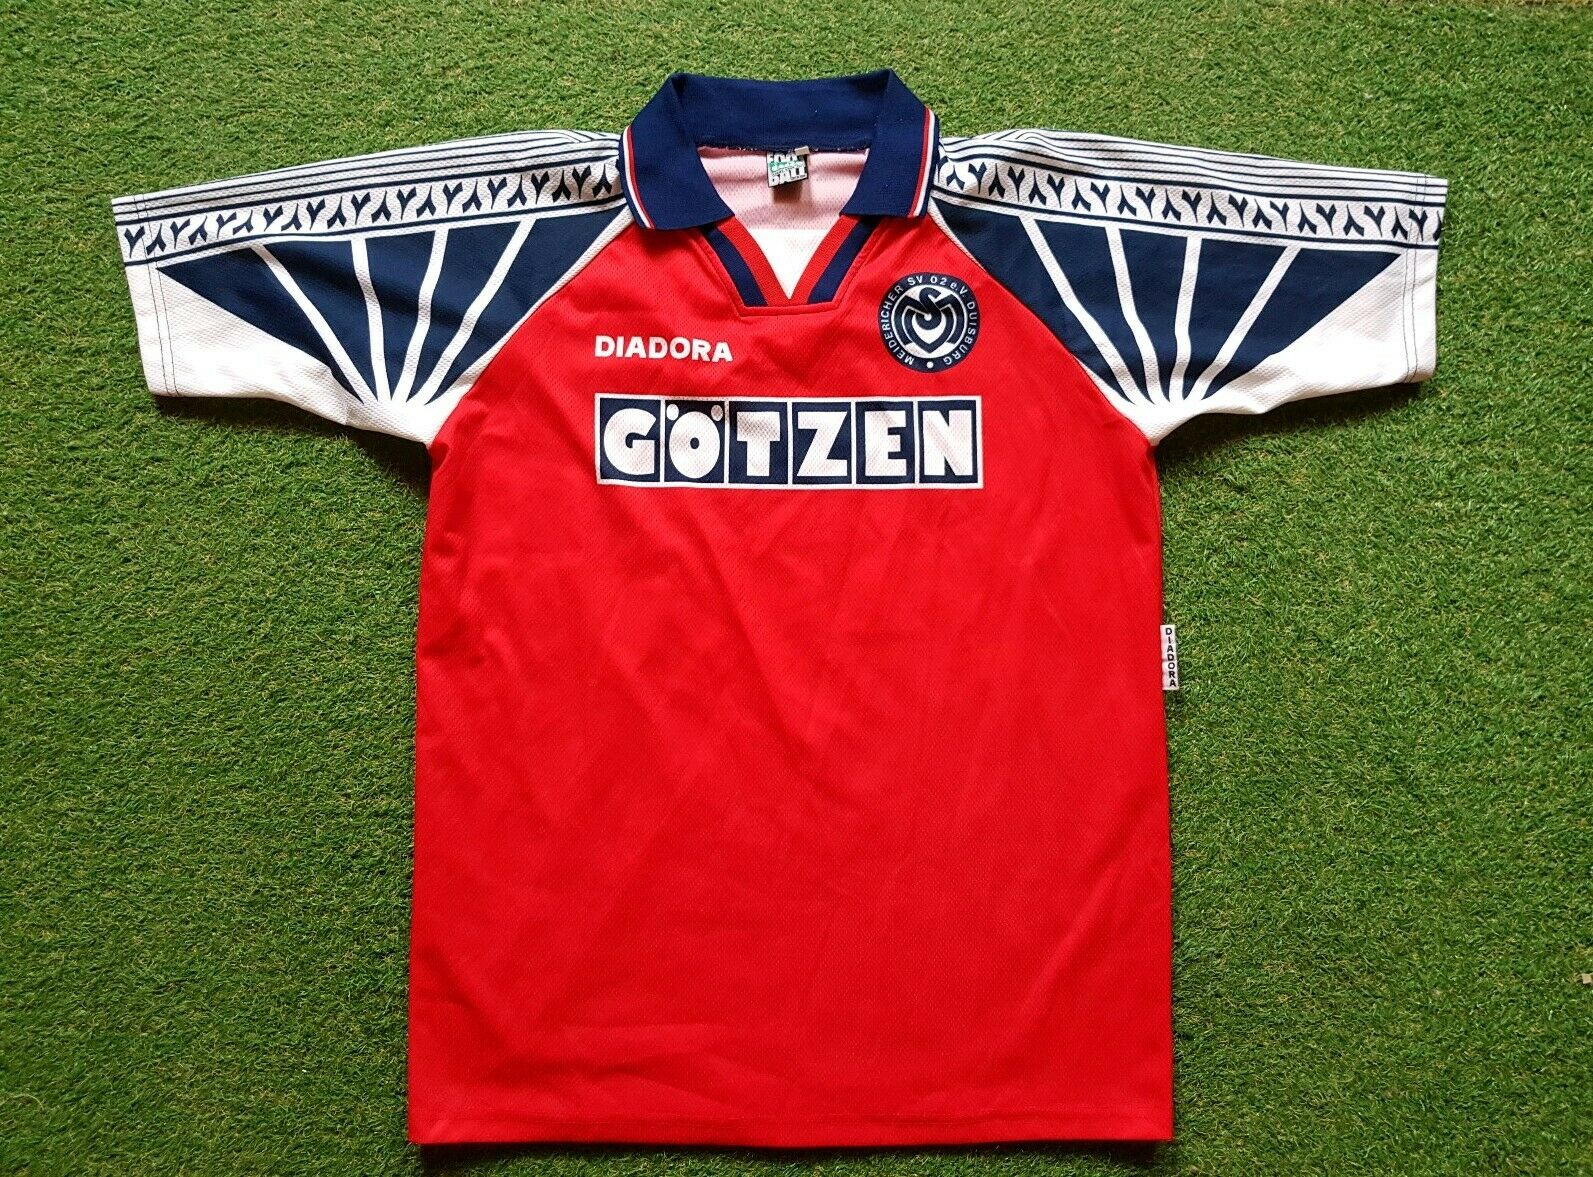 Msv Duisburg Trikot XL 1994 1995 Diadora Calcio Shirt Football Soccer Jersey